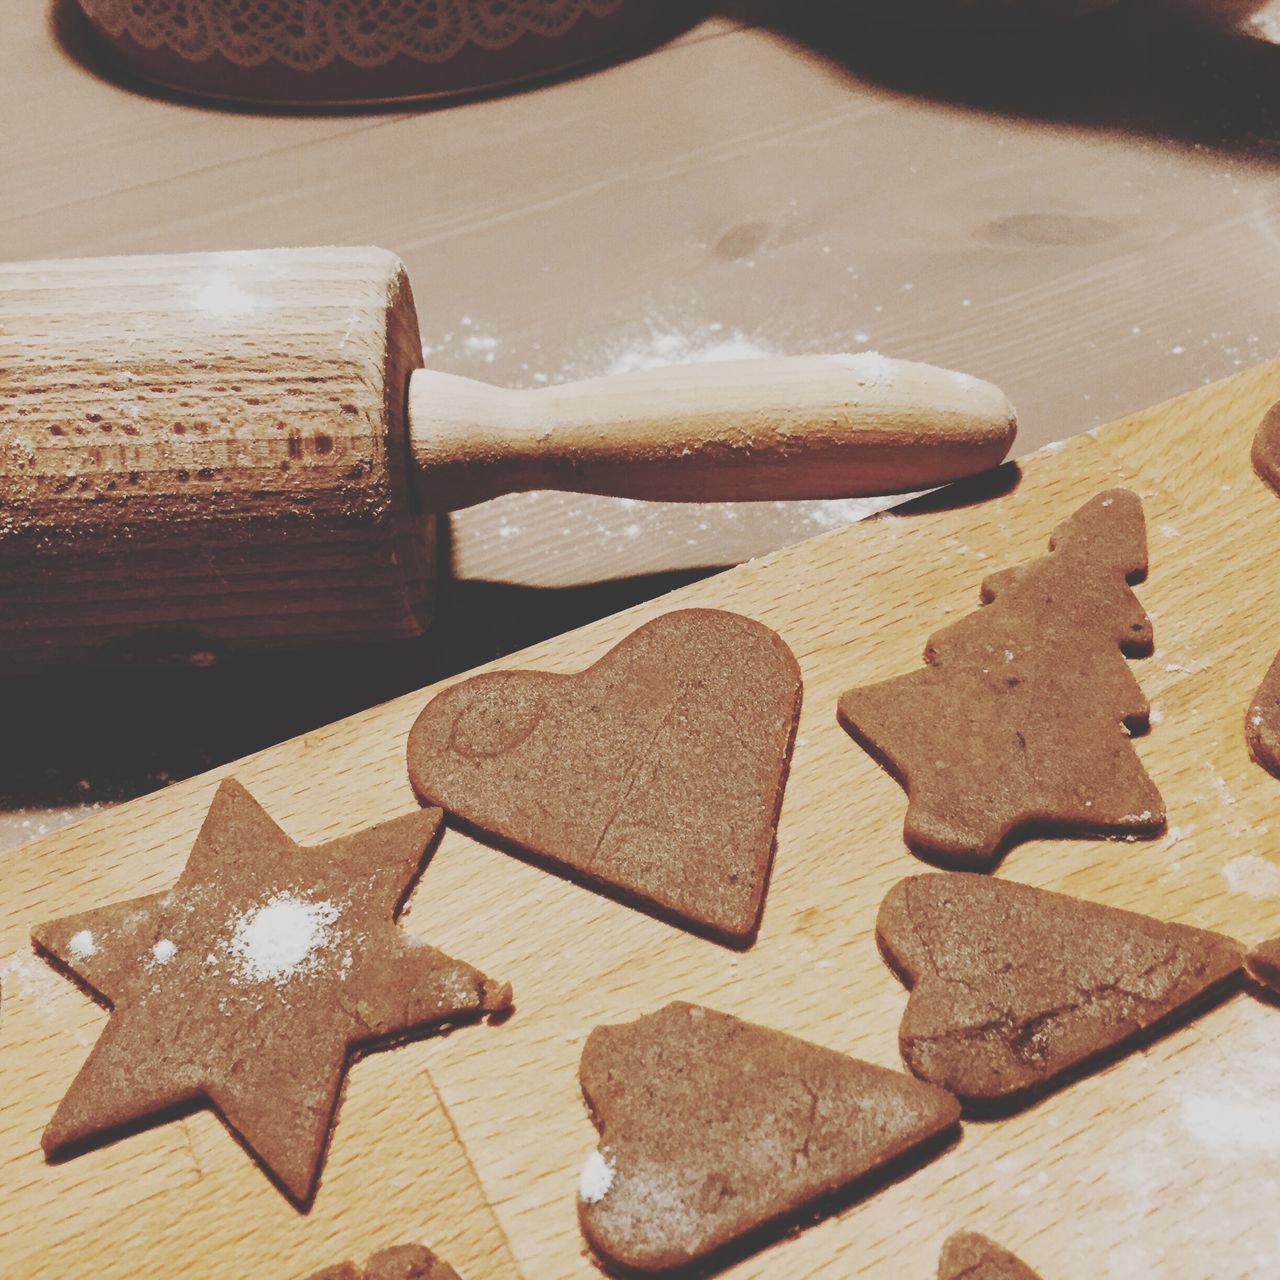 Christmas Food Christmas Tree IPSXmas Merry Christmas! Foodporn Eye4photography  EyeEm Best Shots EyeEm Best Edits EyeEm